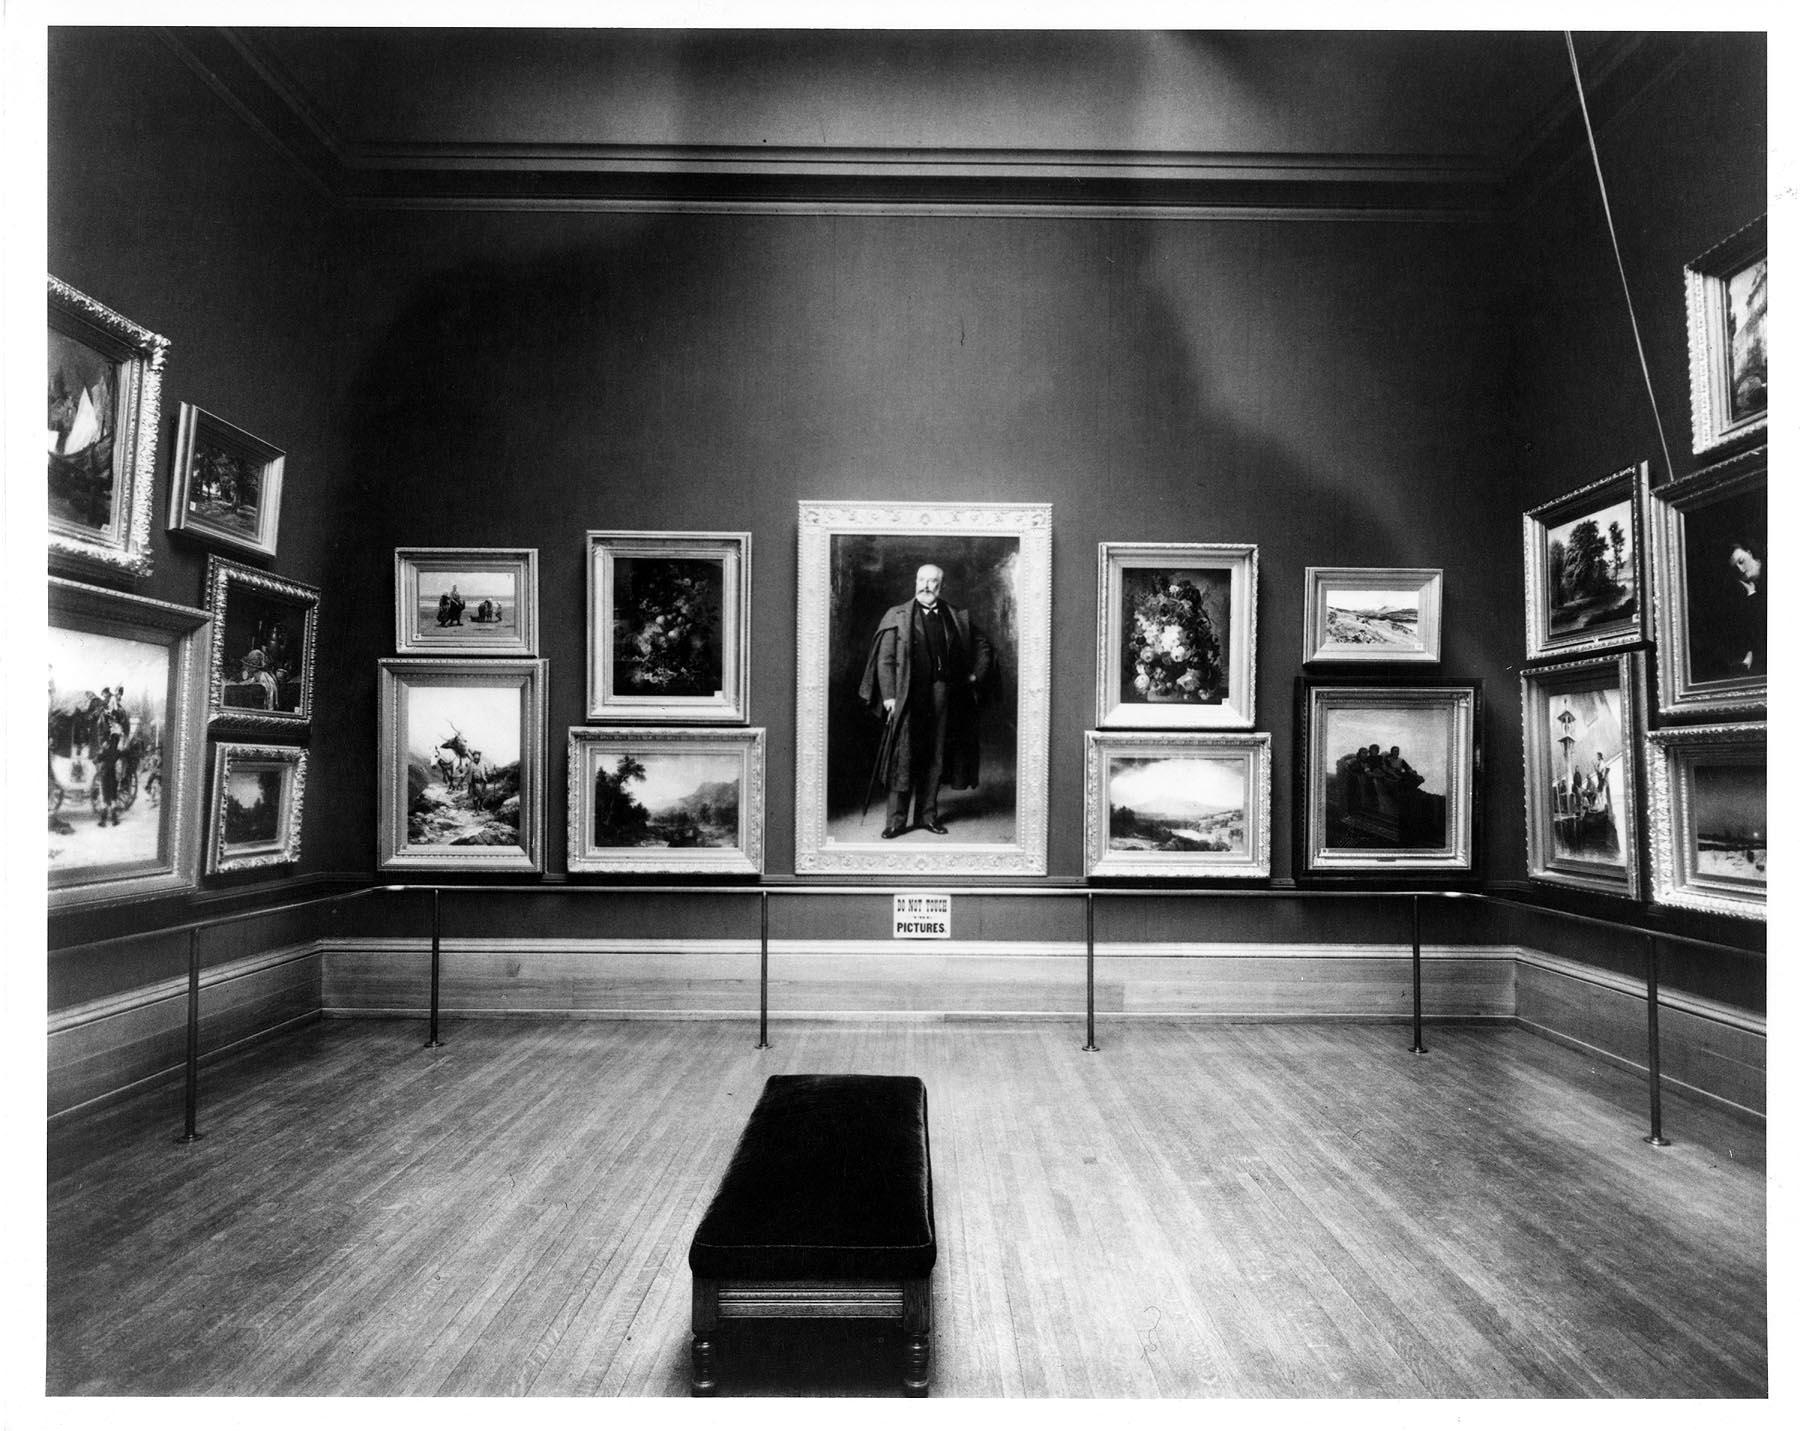 Art Gallery Wall mr. layton's gallery–the salon-style hang | milwaukee art museum blog